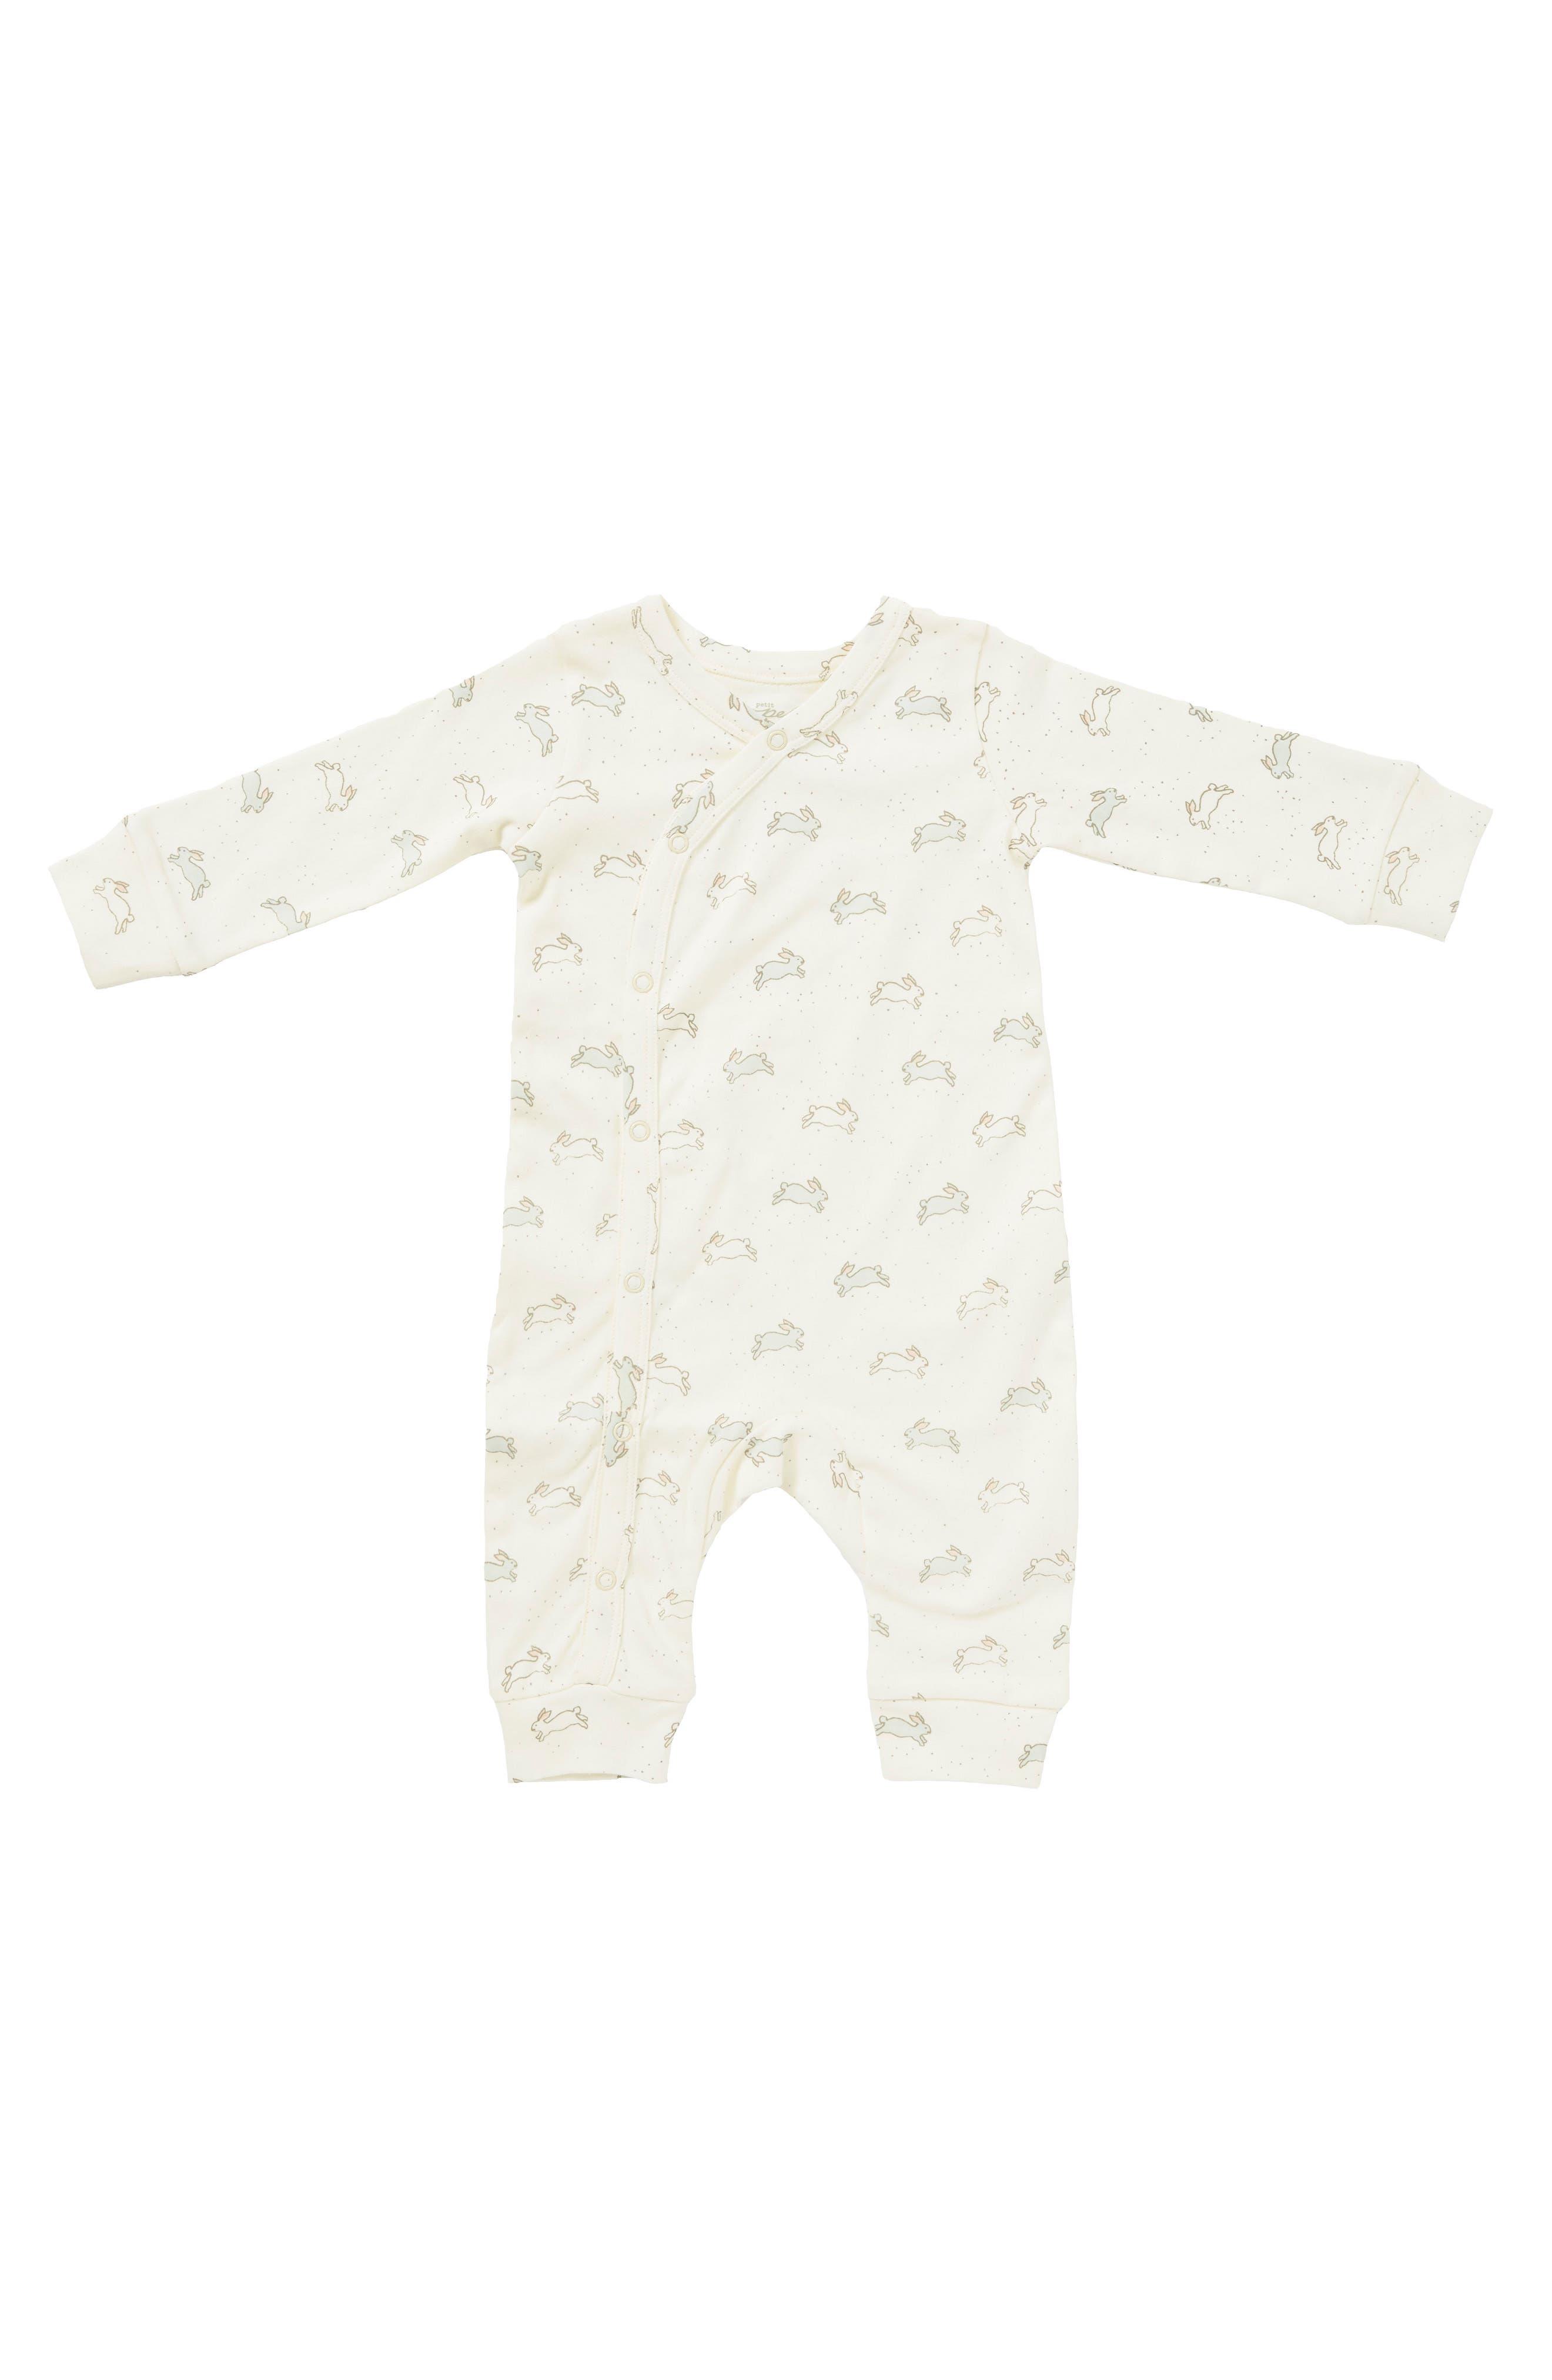 Alternate Image 1 Selected - Petit Pehr Tiny Bunny Romper (Baby)